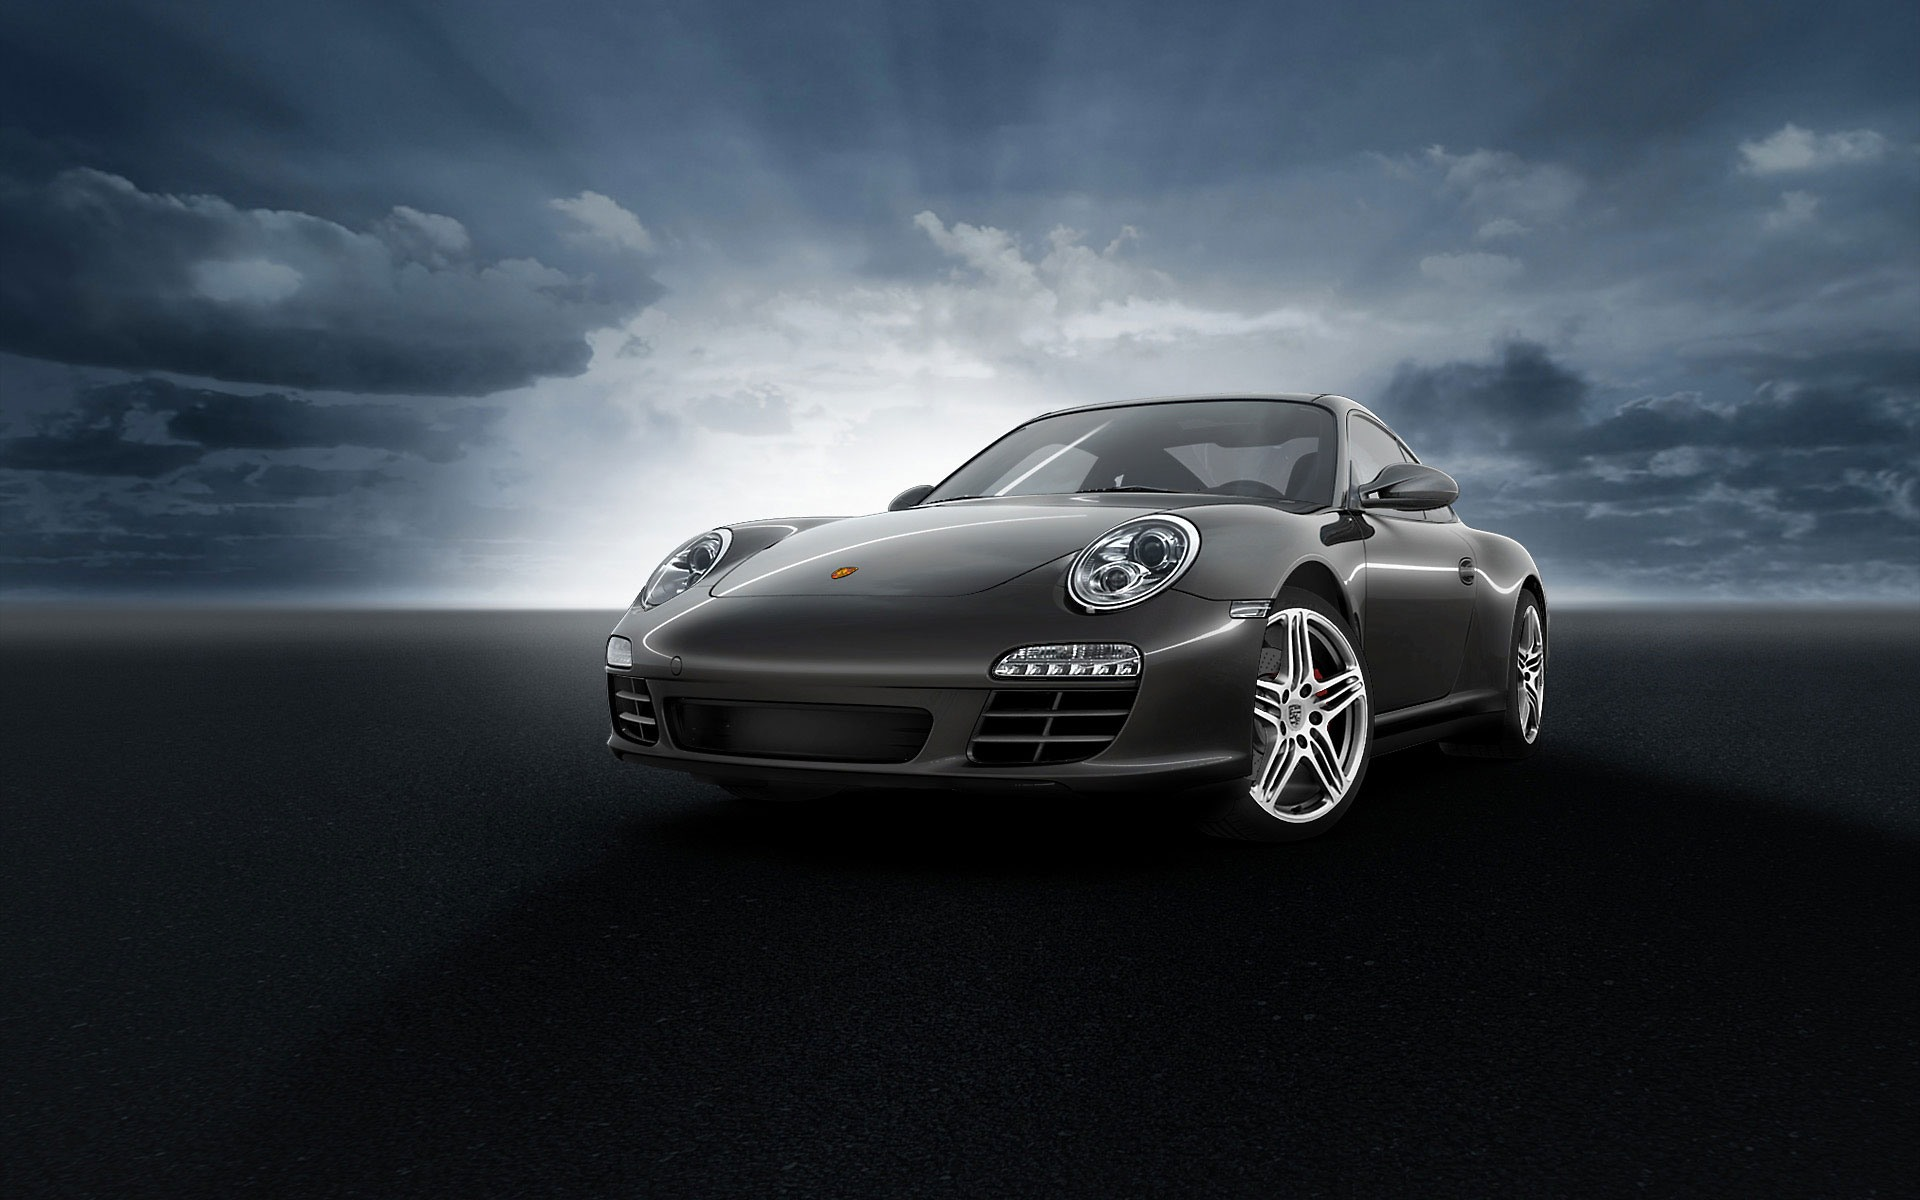 Porsche 911 Carrera 4S wallpaper   703446 1920x1200